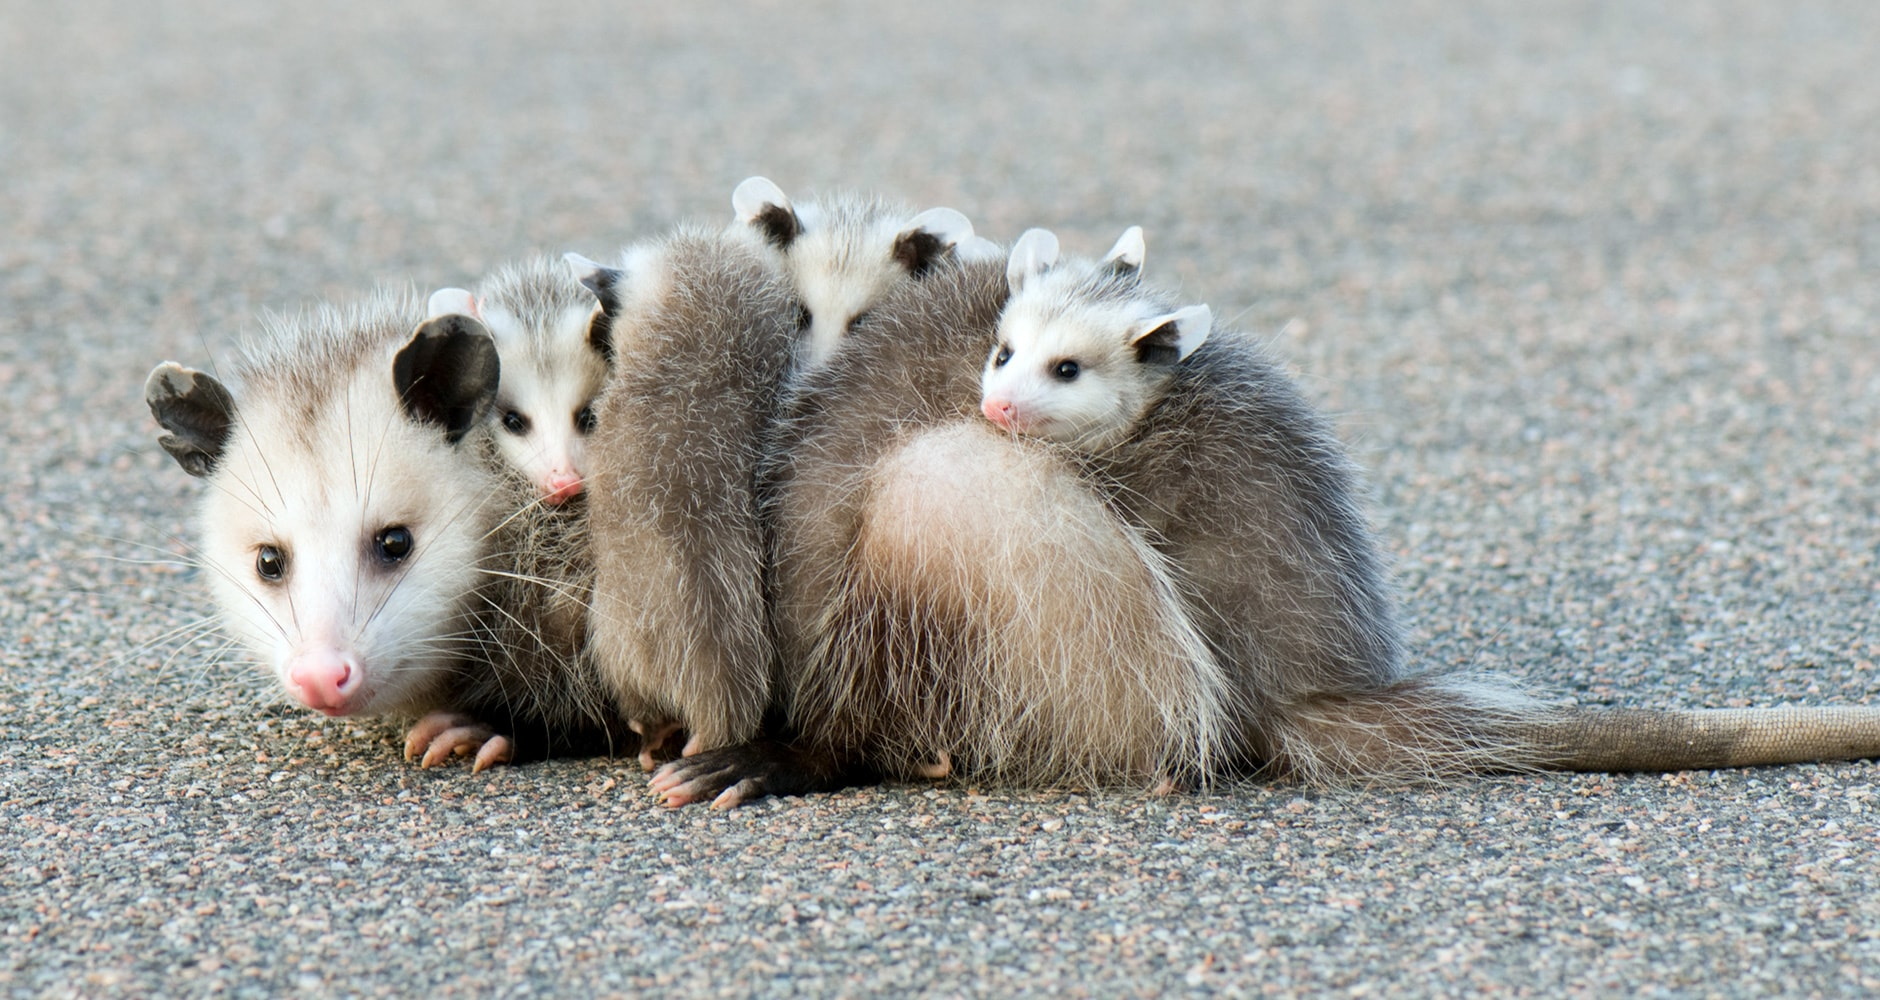 opossum facts - several opossums huddled together